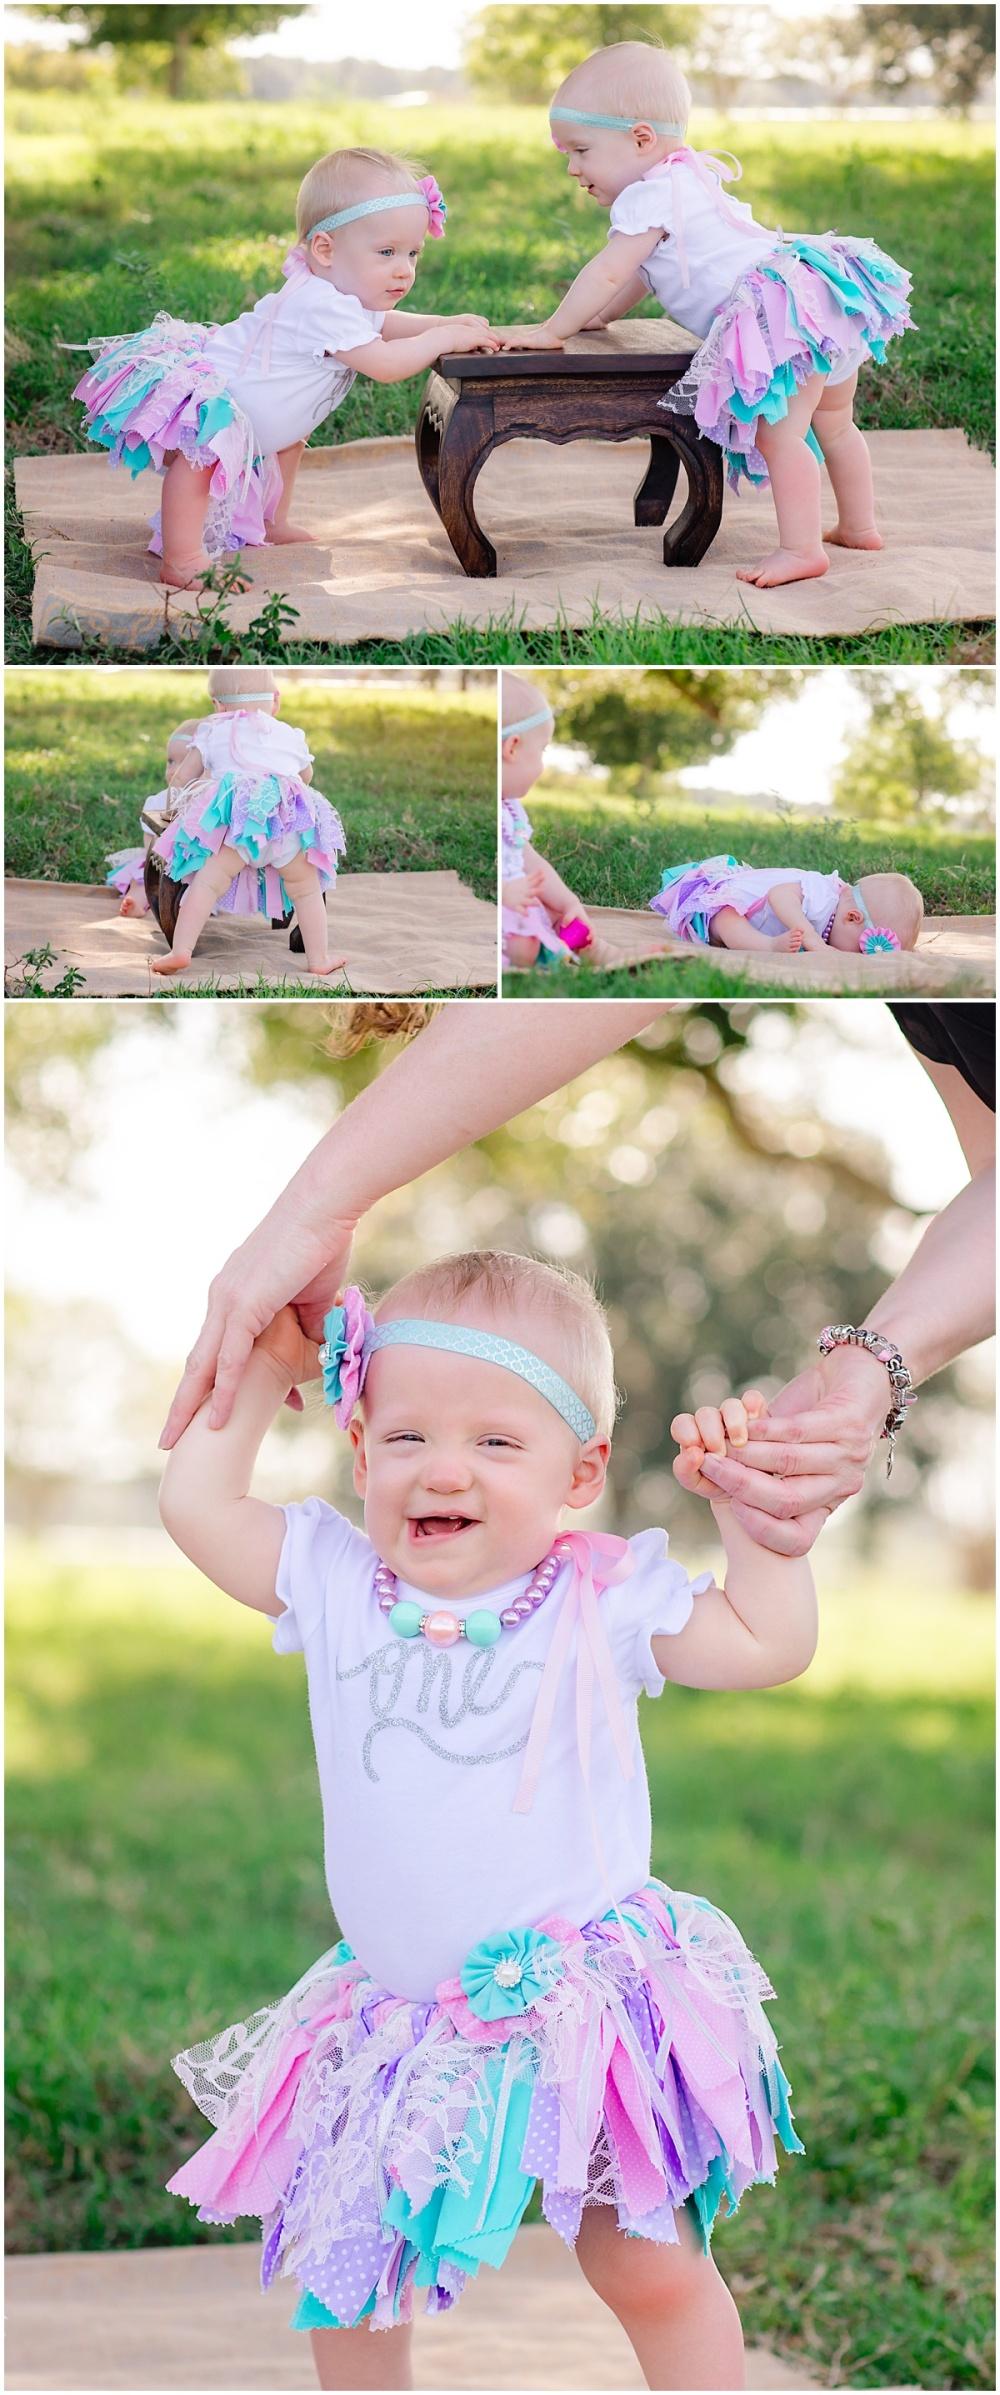 Family-Children-Portraits-Cake-Smash-Photos-San-Antonio-Hill-Country-Texas-Carly-Barton-Photography_0007.jpg